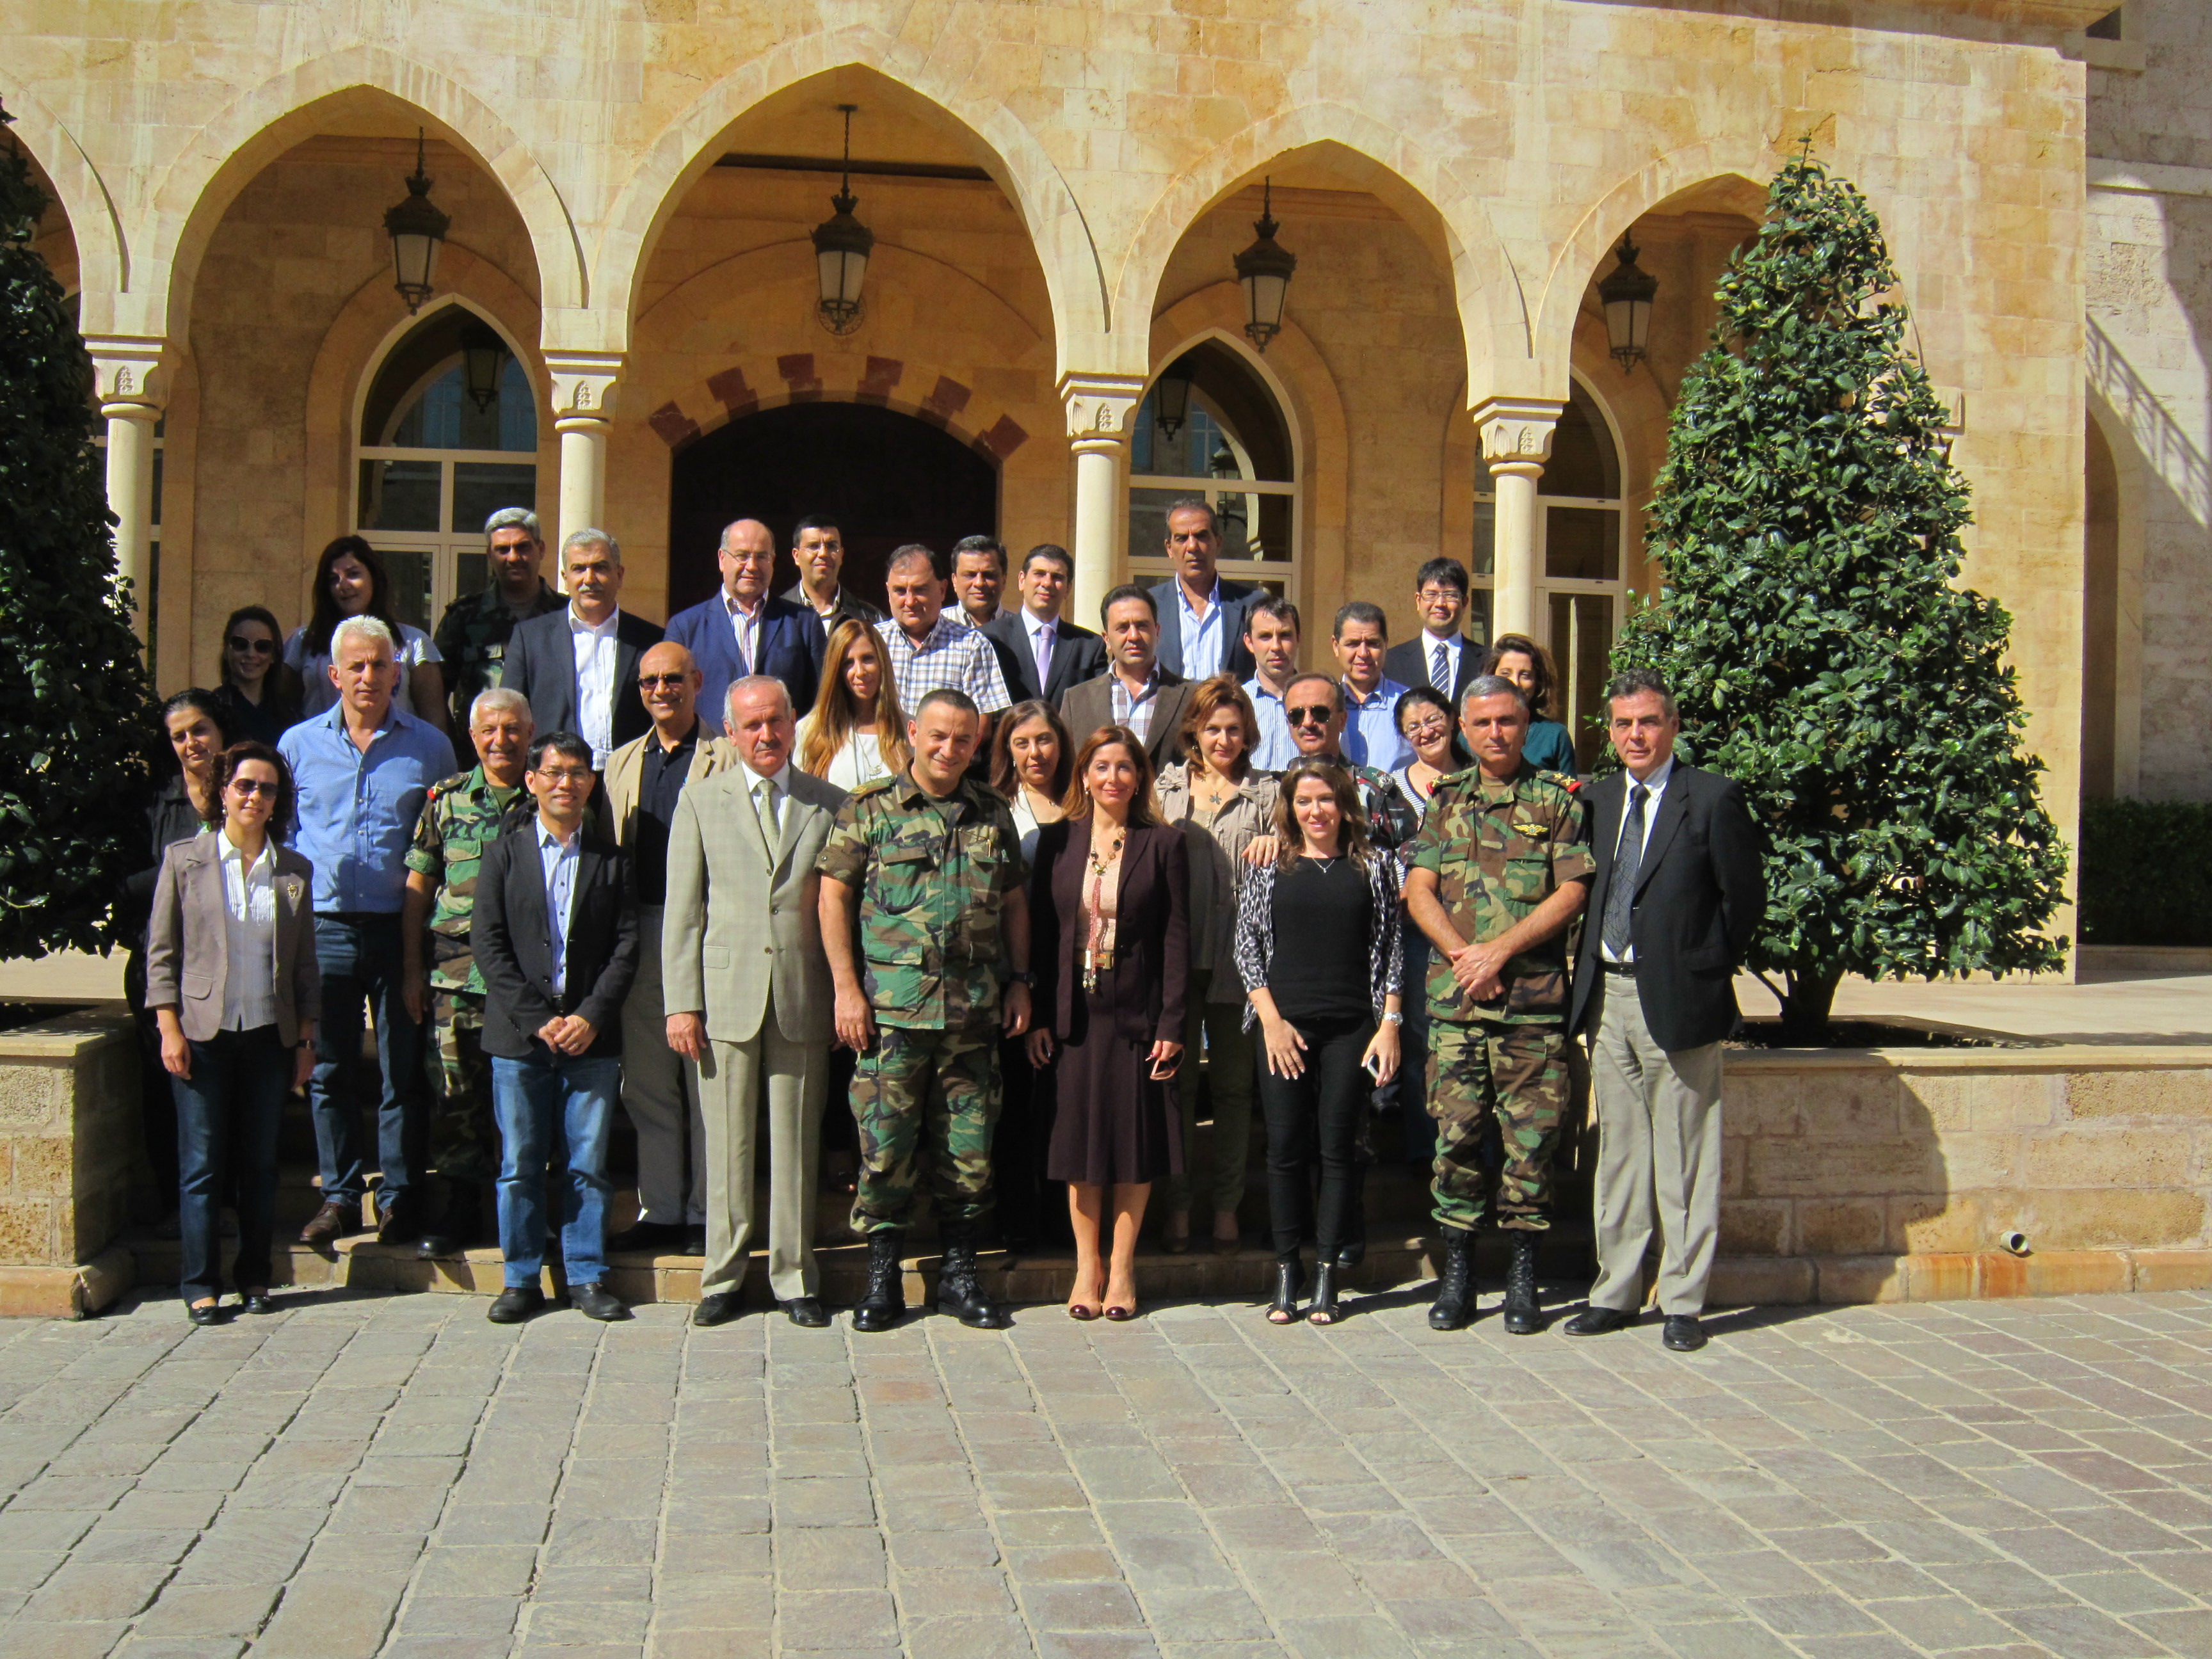 http://www.adrc.asia/adrcreport_j/items/Lebanon%20%282013%29.JPG